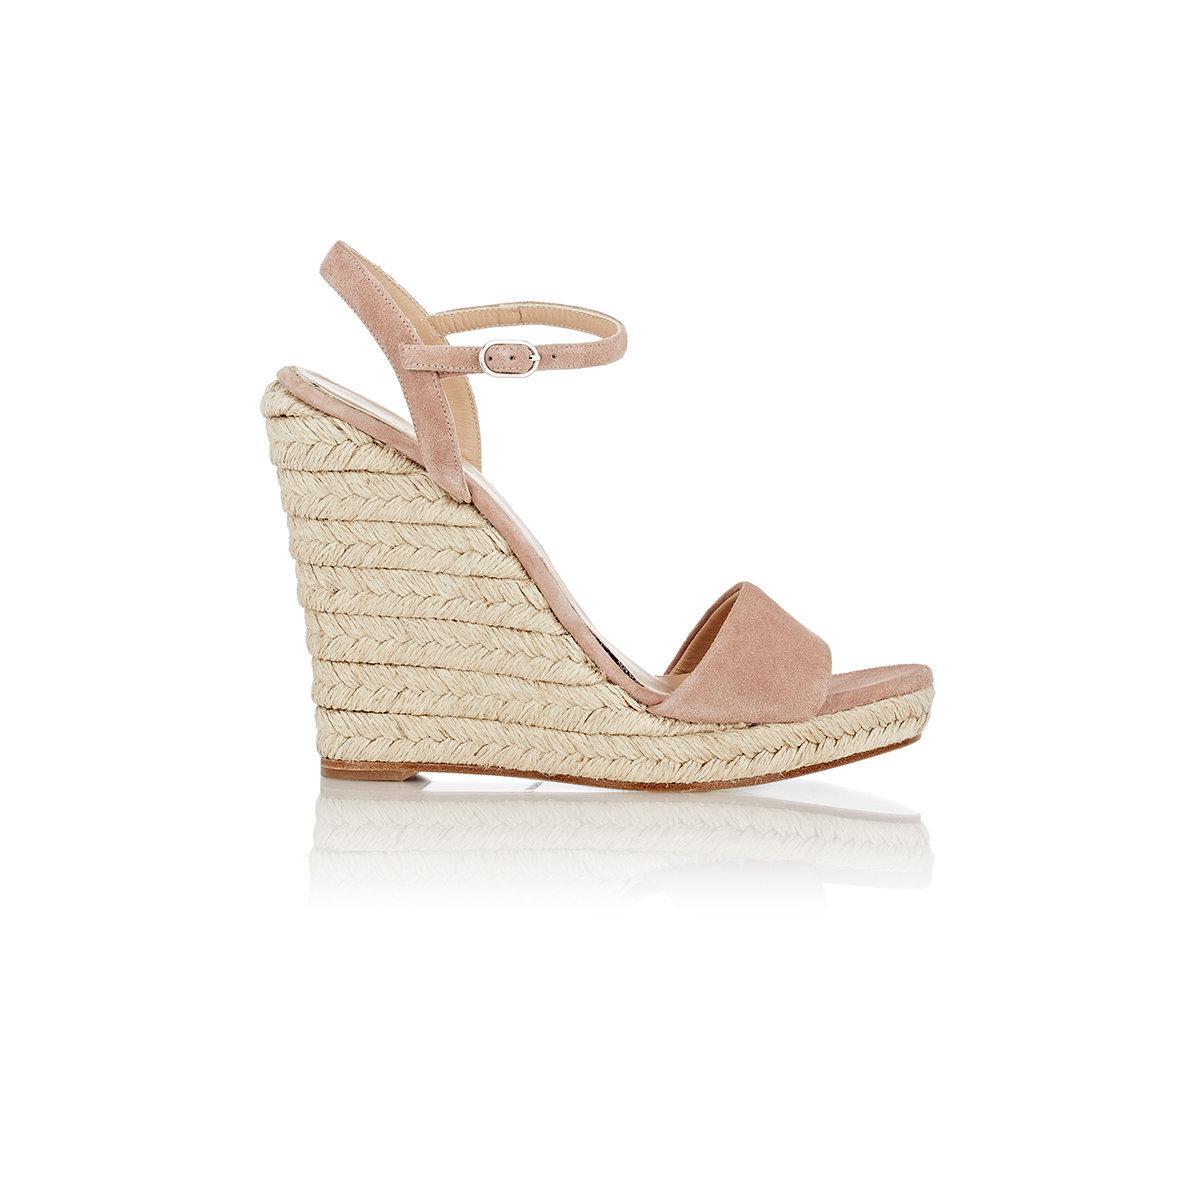 Womens Fania Platform Wedge Sandals Barneys New York rNrnj8ALpG